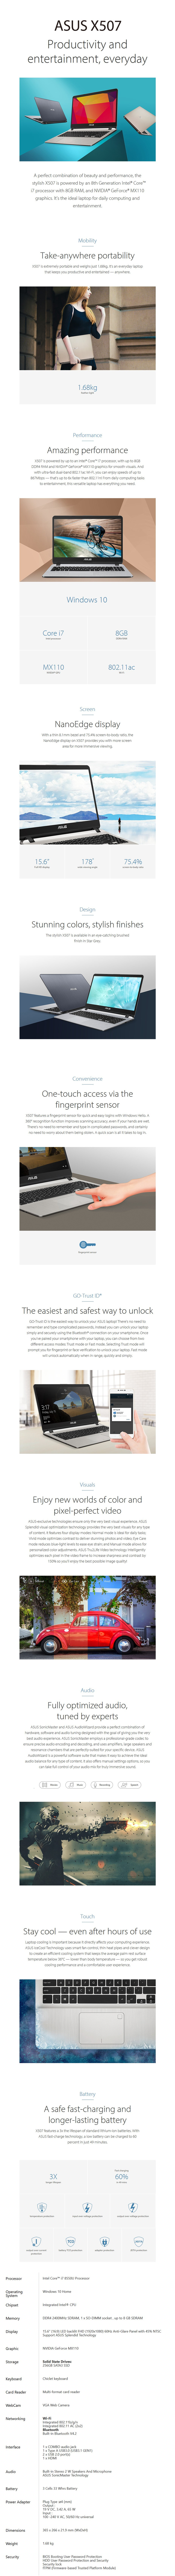 "ASUS X507UB 15.6"" Notebook i7-8550U 8GB 256GB MX110 Win10 - Desktop Overview 1"